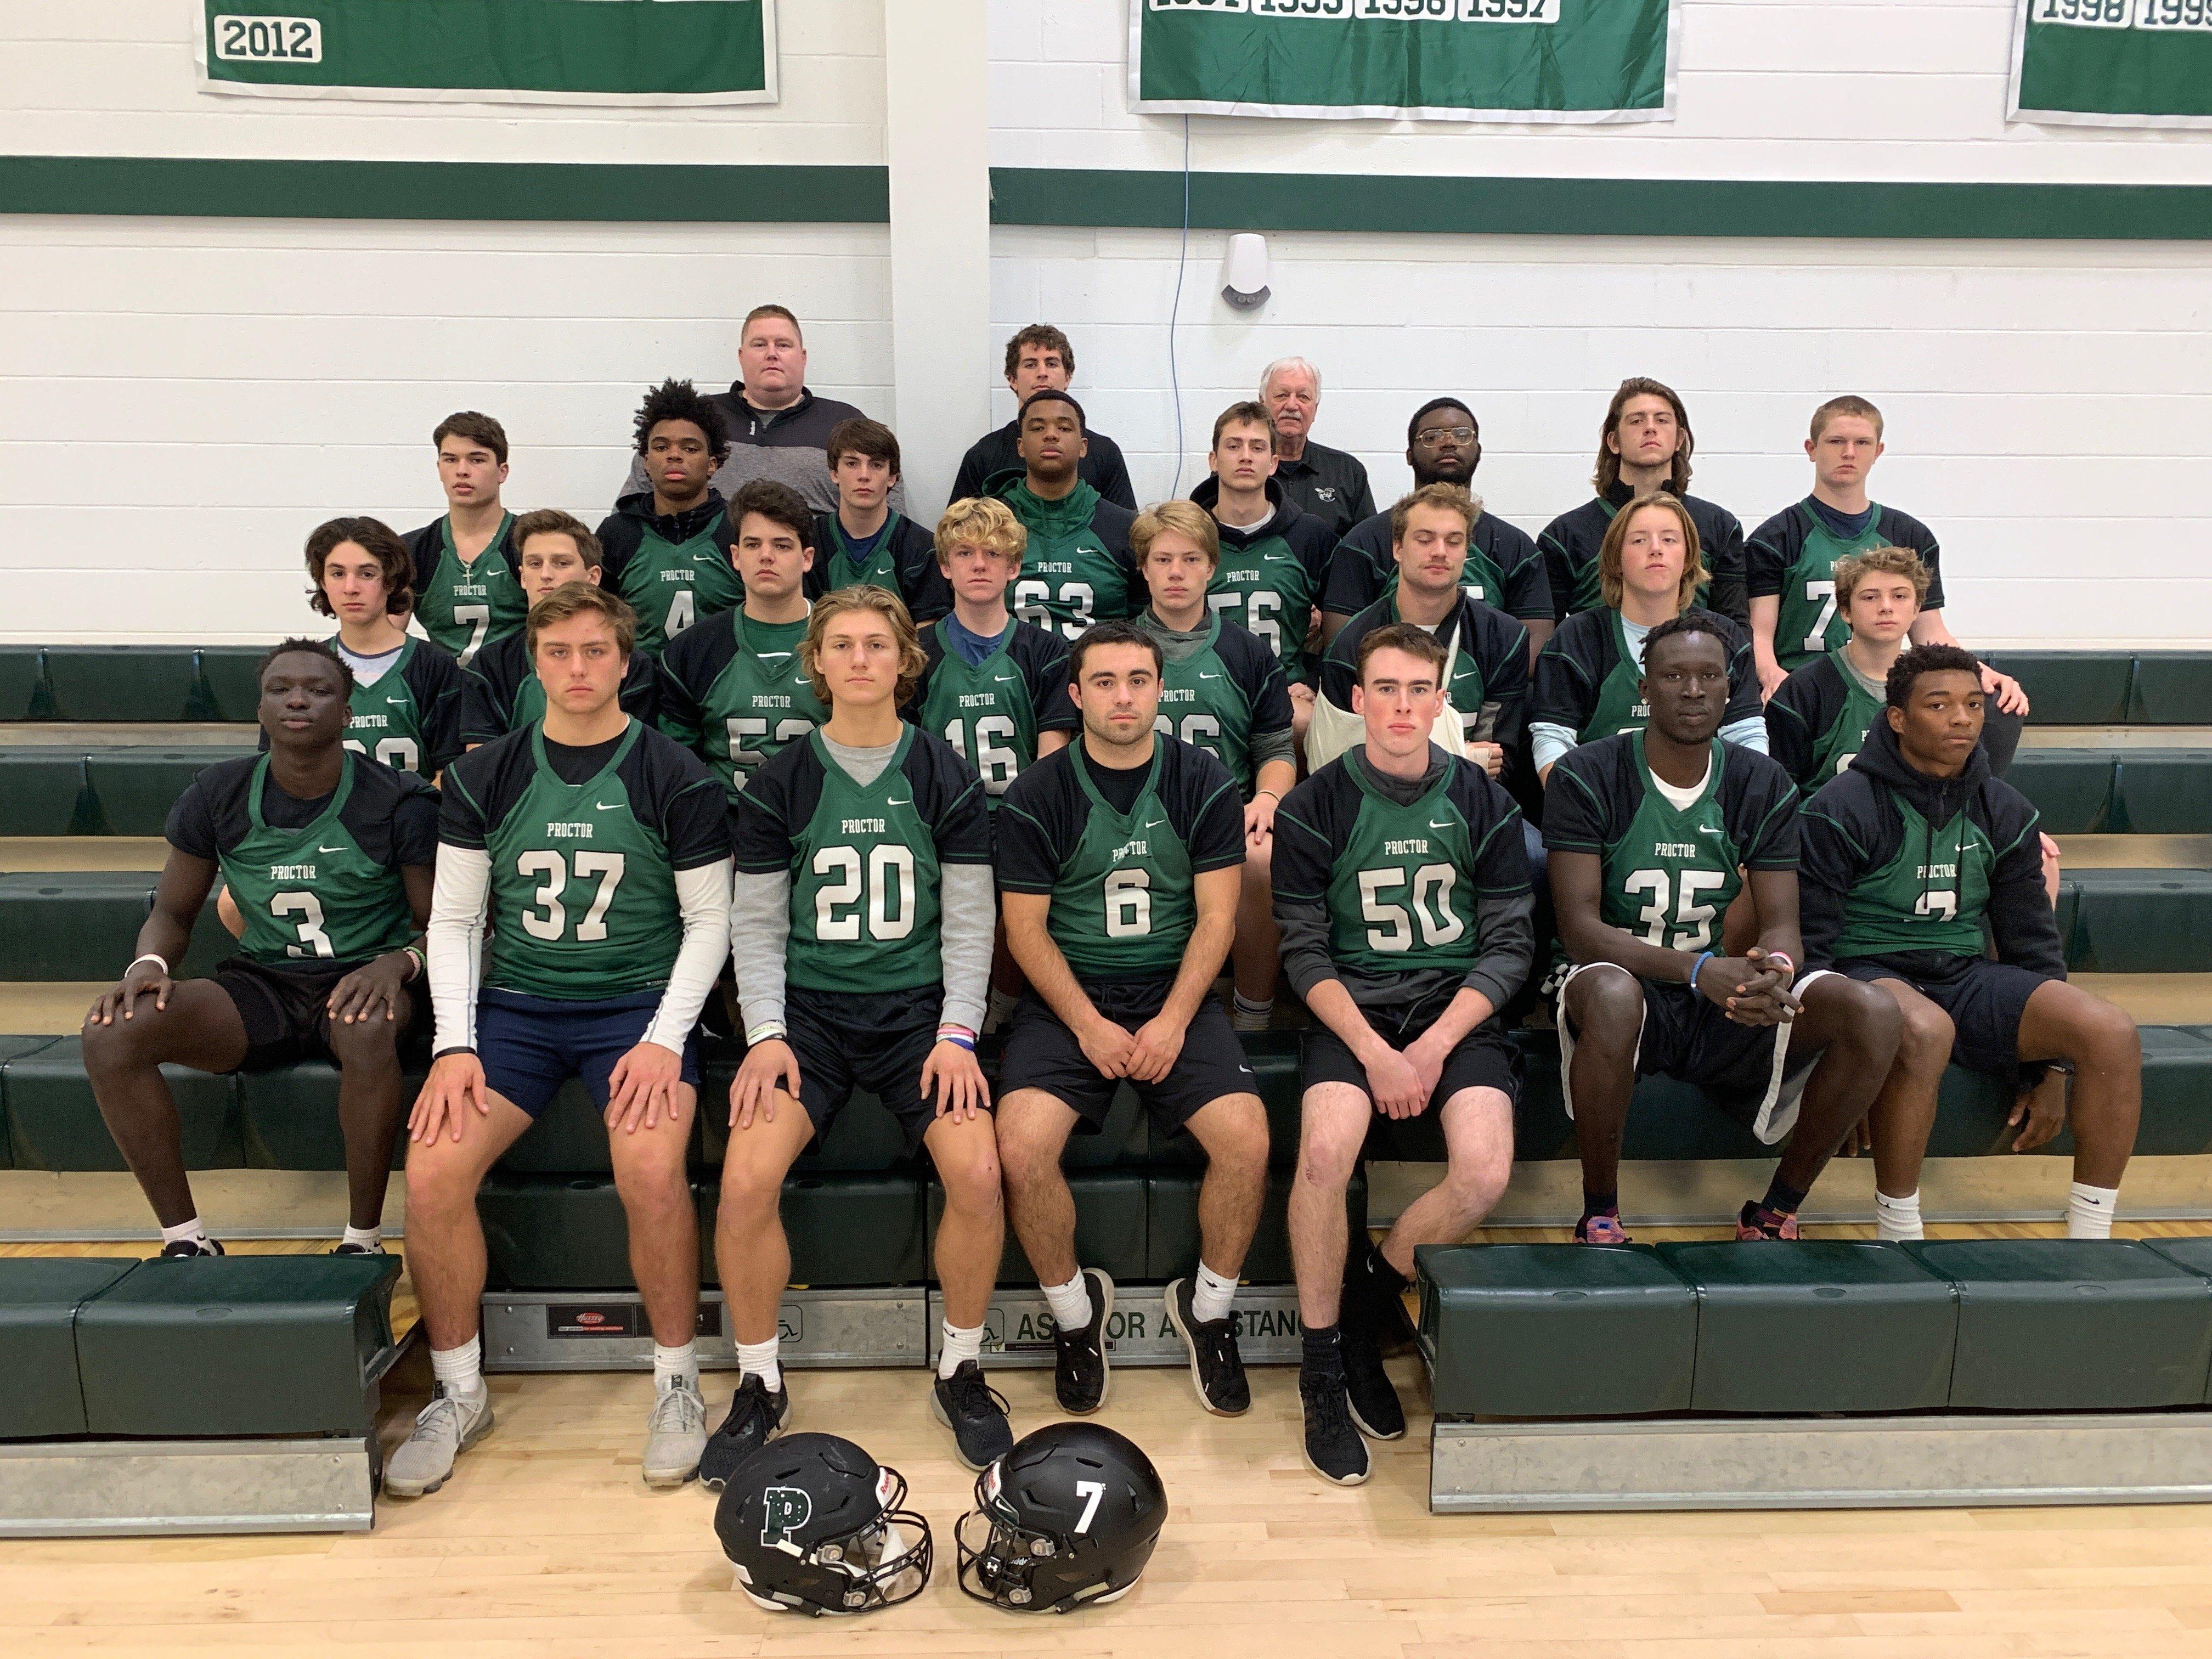 Proctor Academy Football Athletics Boarding School New England